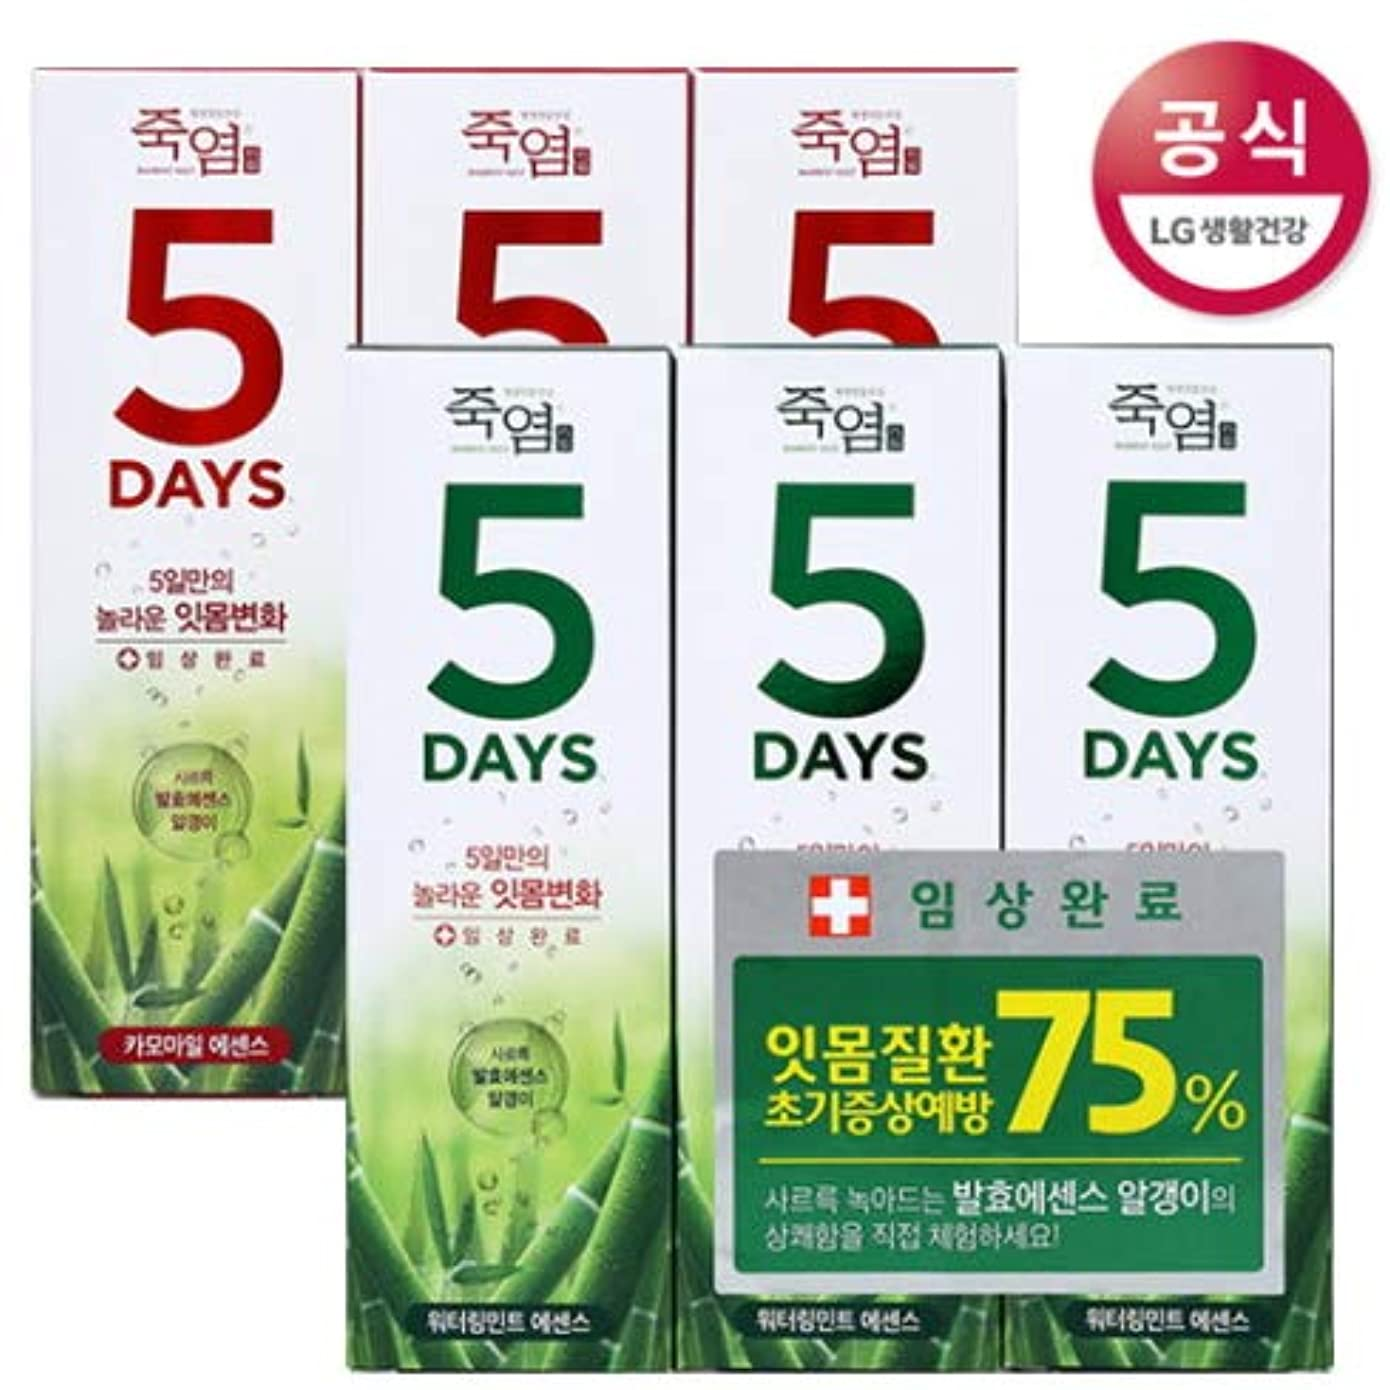 [LG HnB] Bamboo Salt 5days Toothpaste /竹塩5days歯磨き粉 100gx6個(海外直送品)